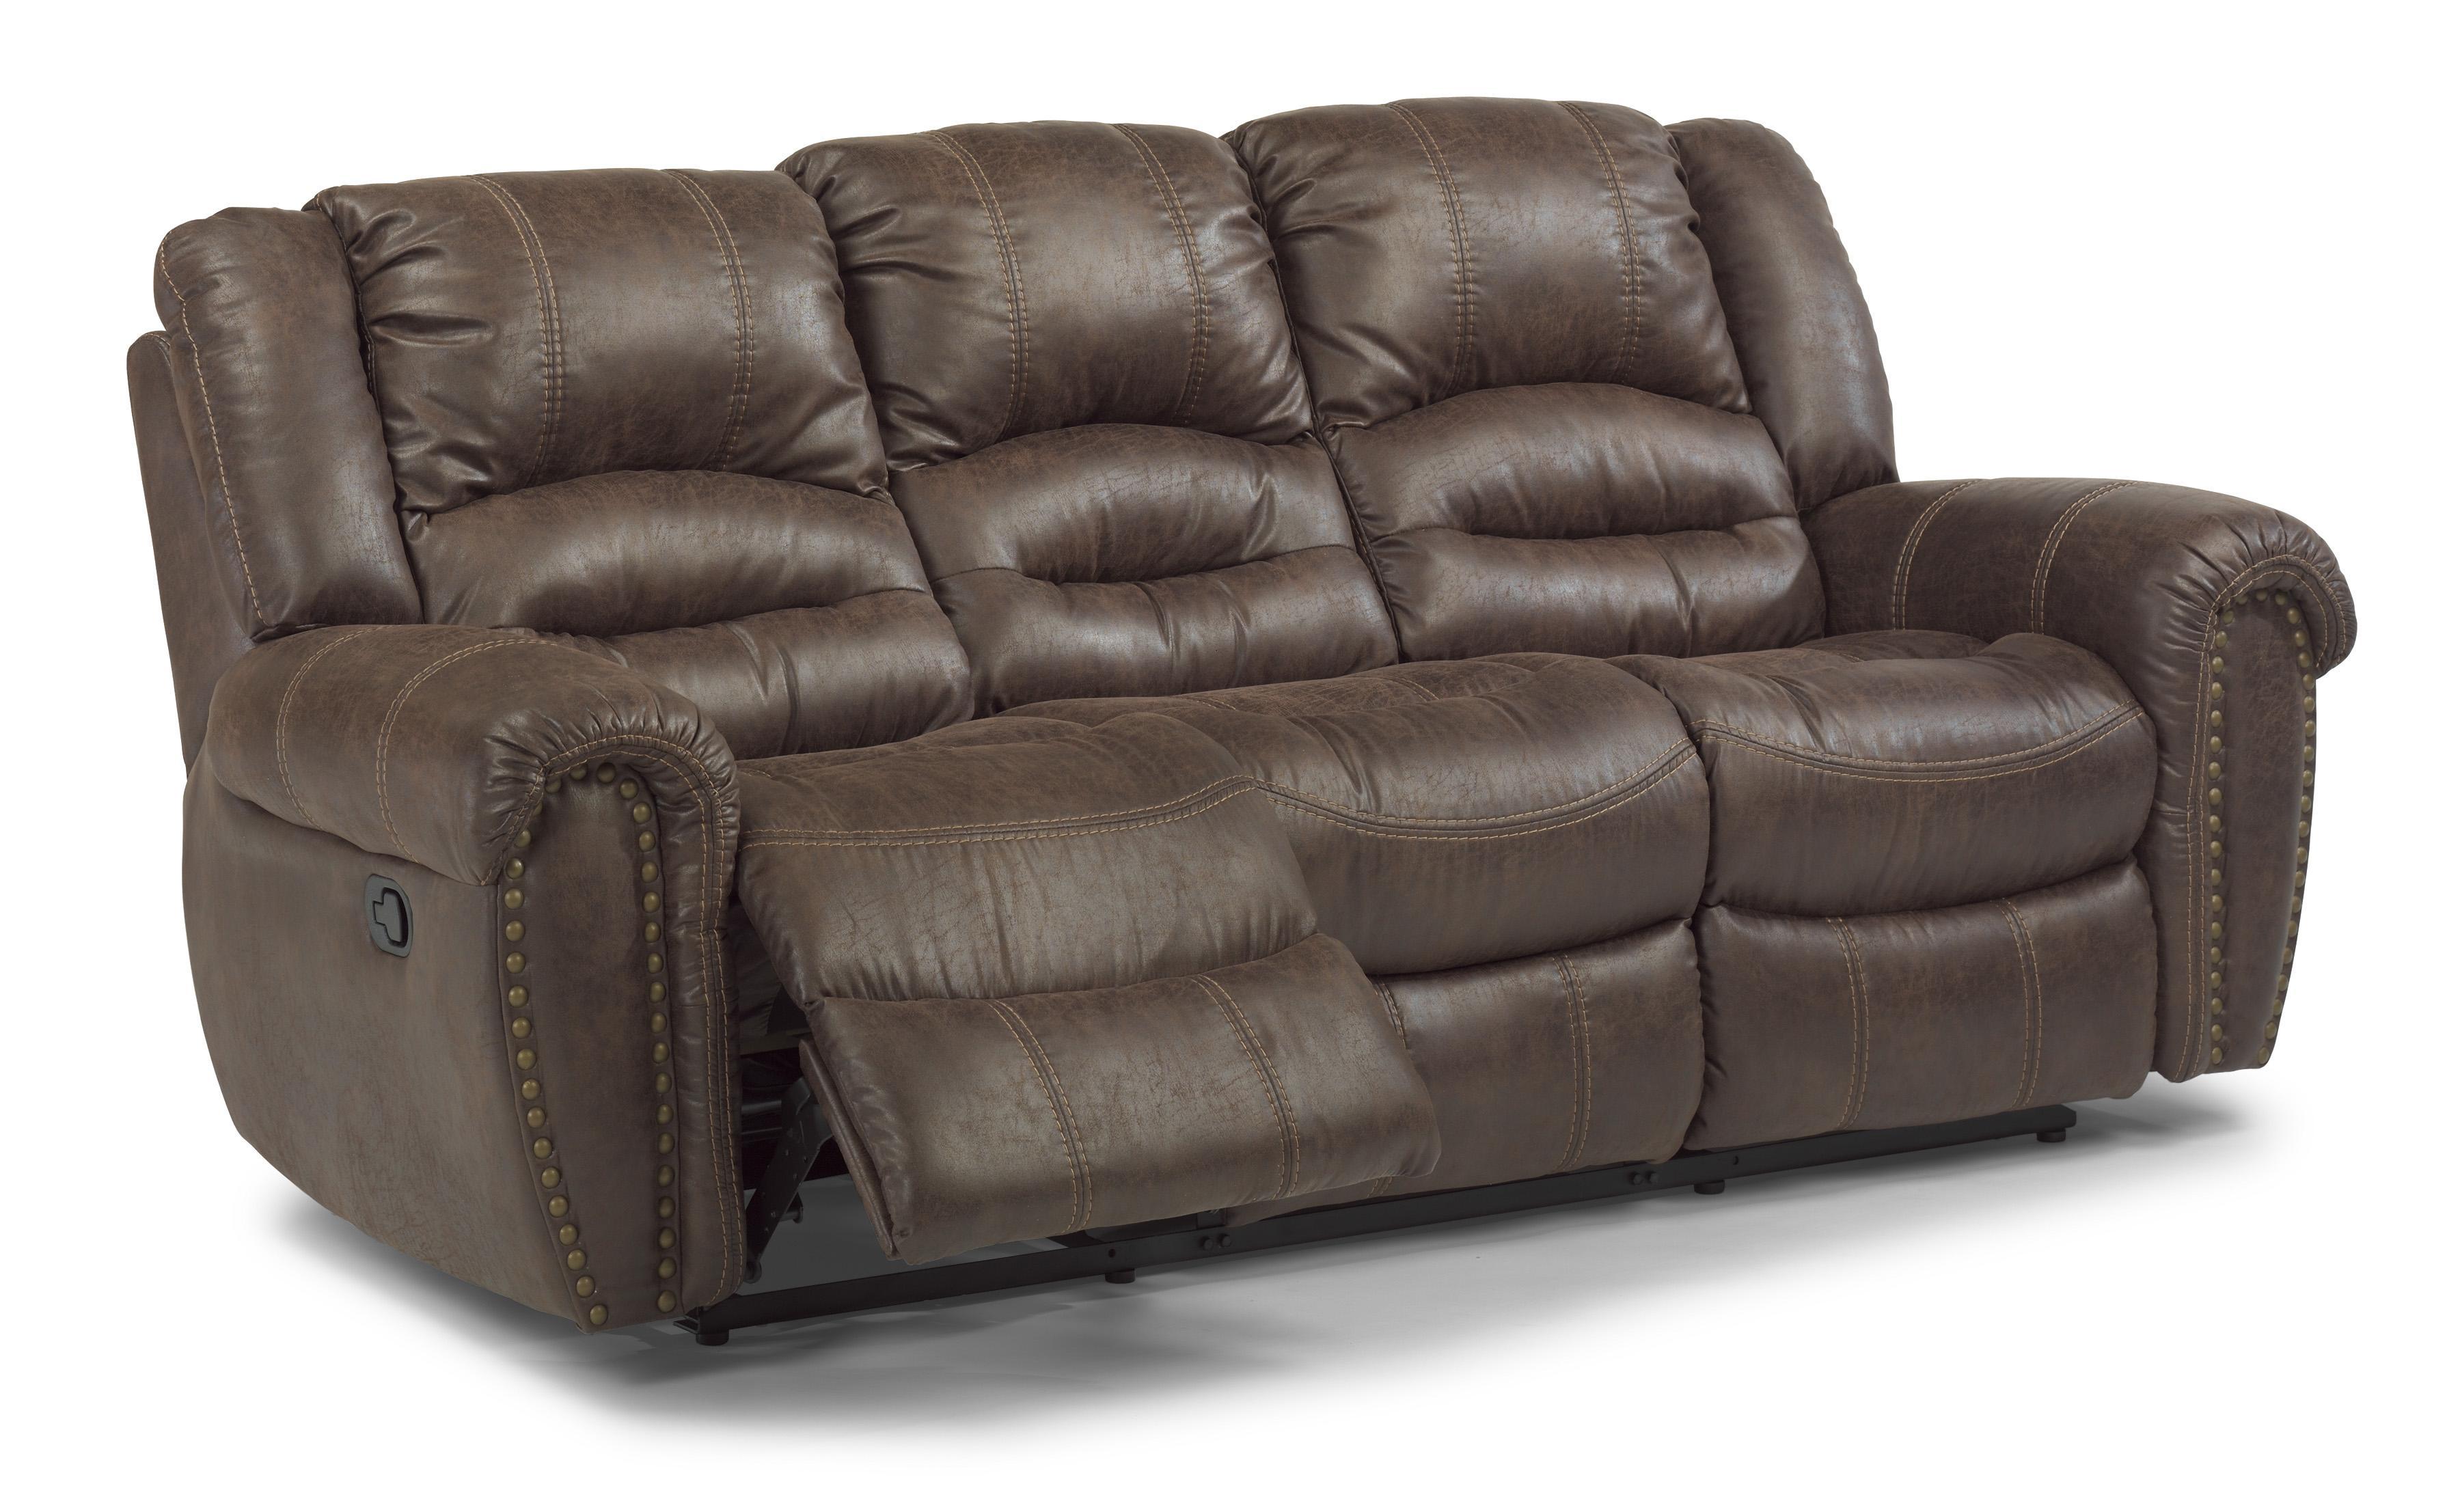 flexsteel capitol double reclining sofa covering dublin latitudes downtown 1710 62p transitional power